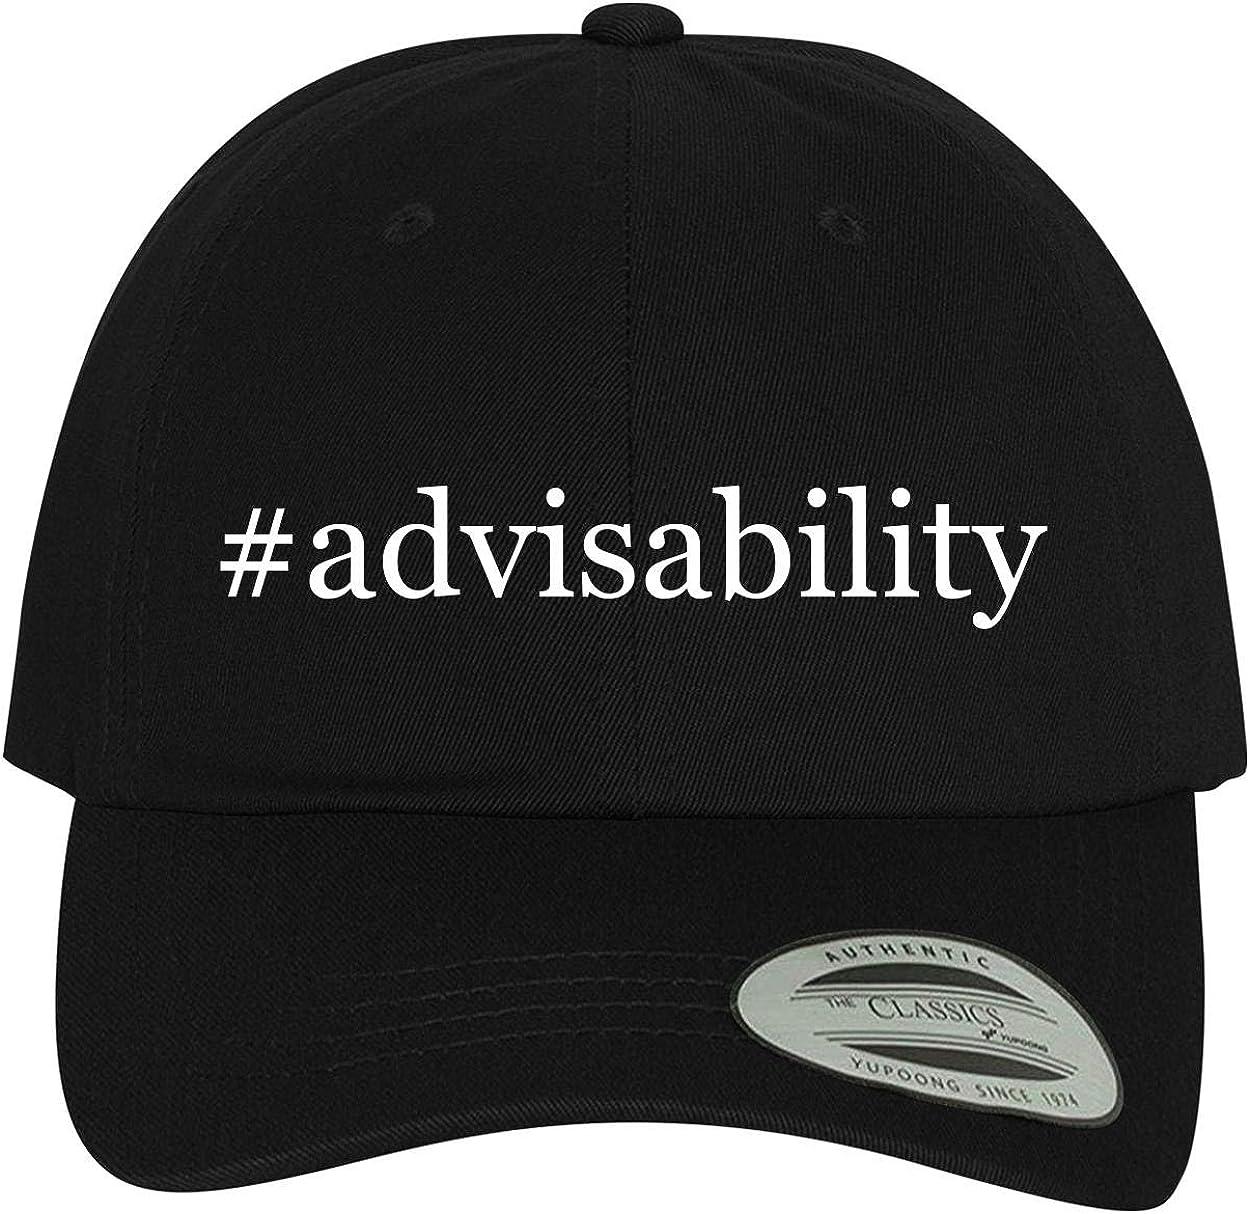 BH Cool Designs #Advisability Comfortable Dad Hat Baseball Cap